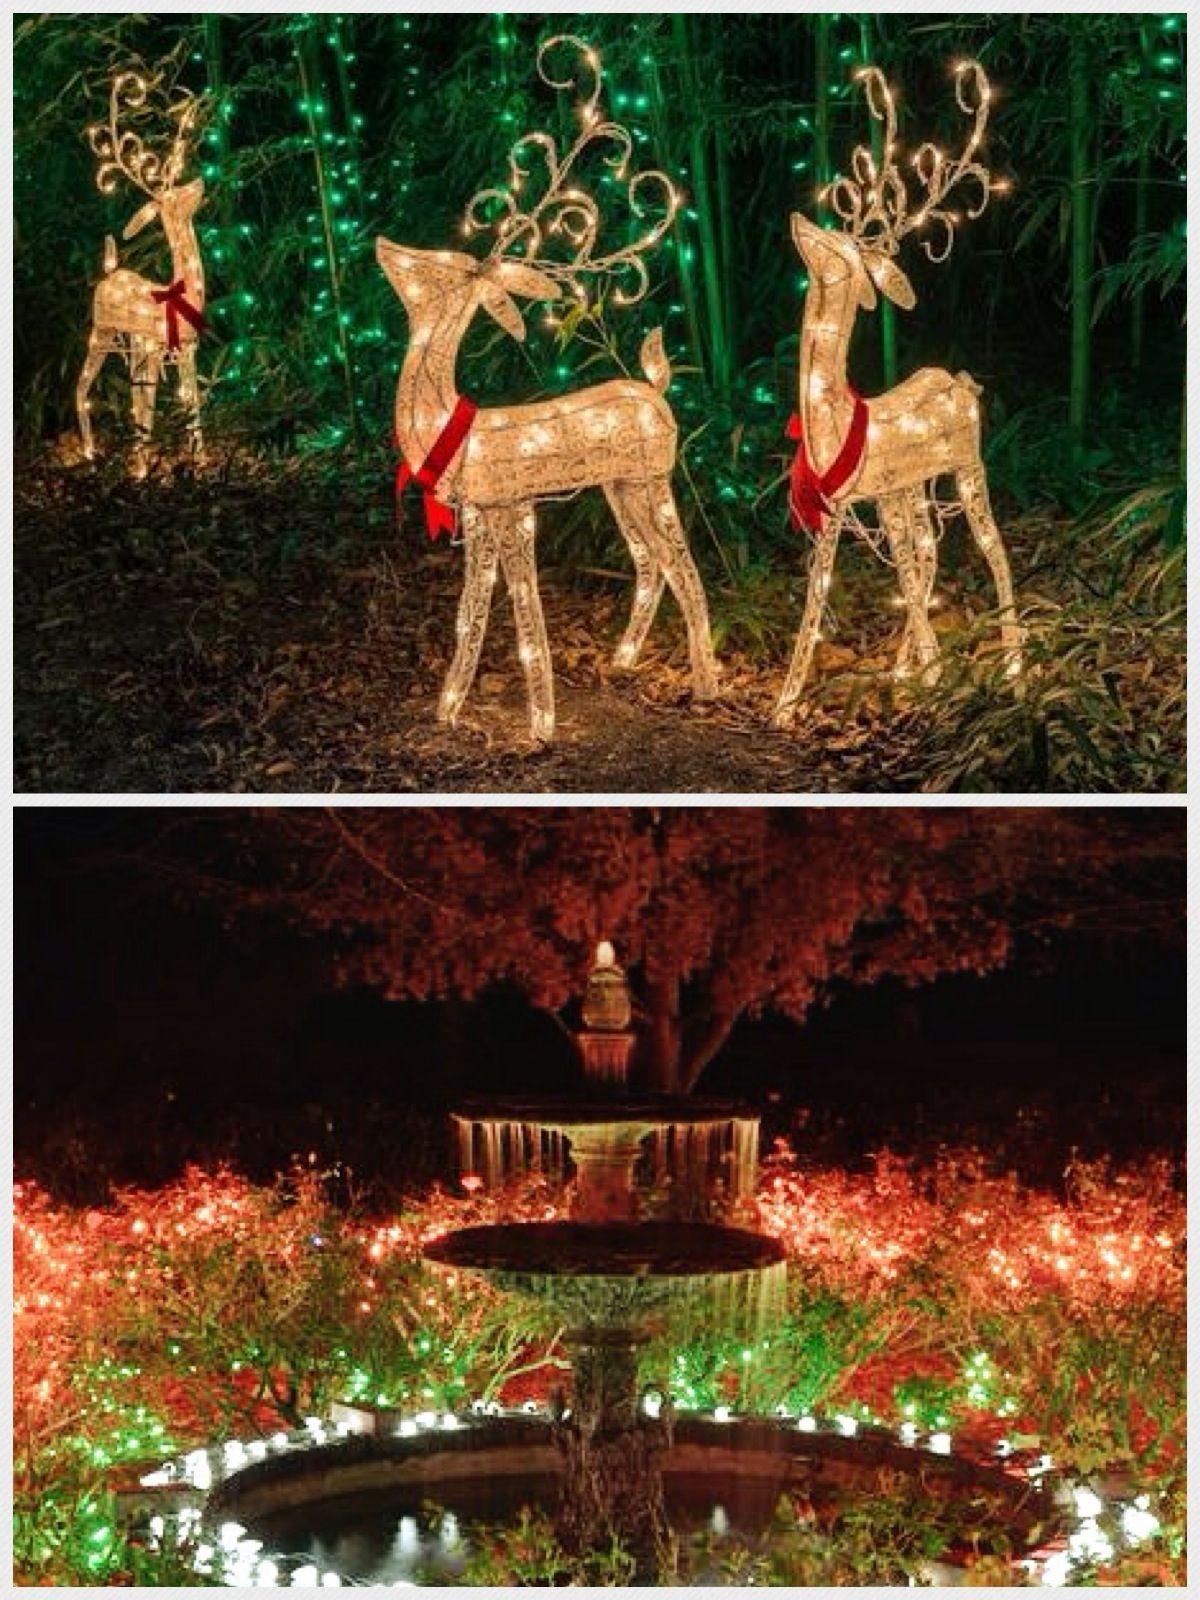 December Nights & Holiday Lights @ Coastal Georgia Botanical Gardens ...